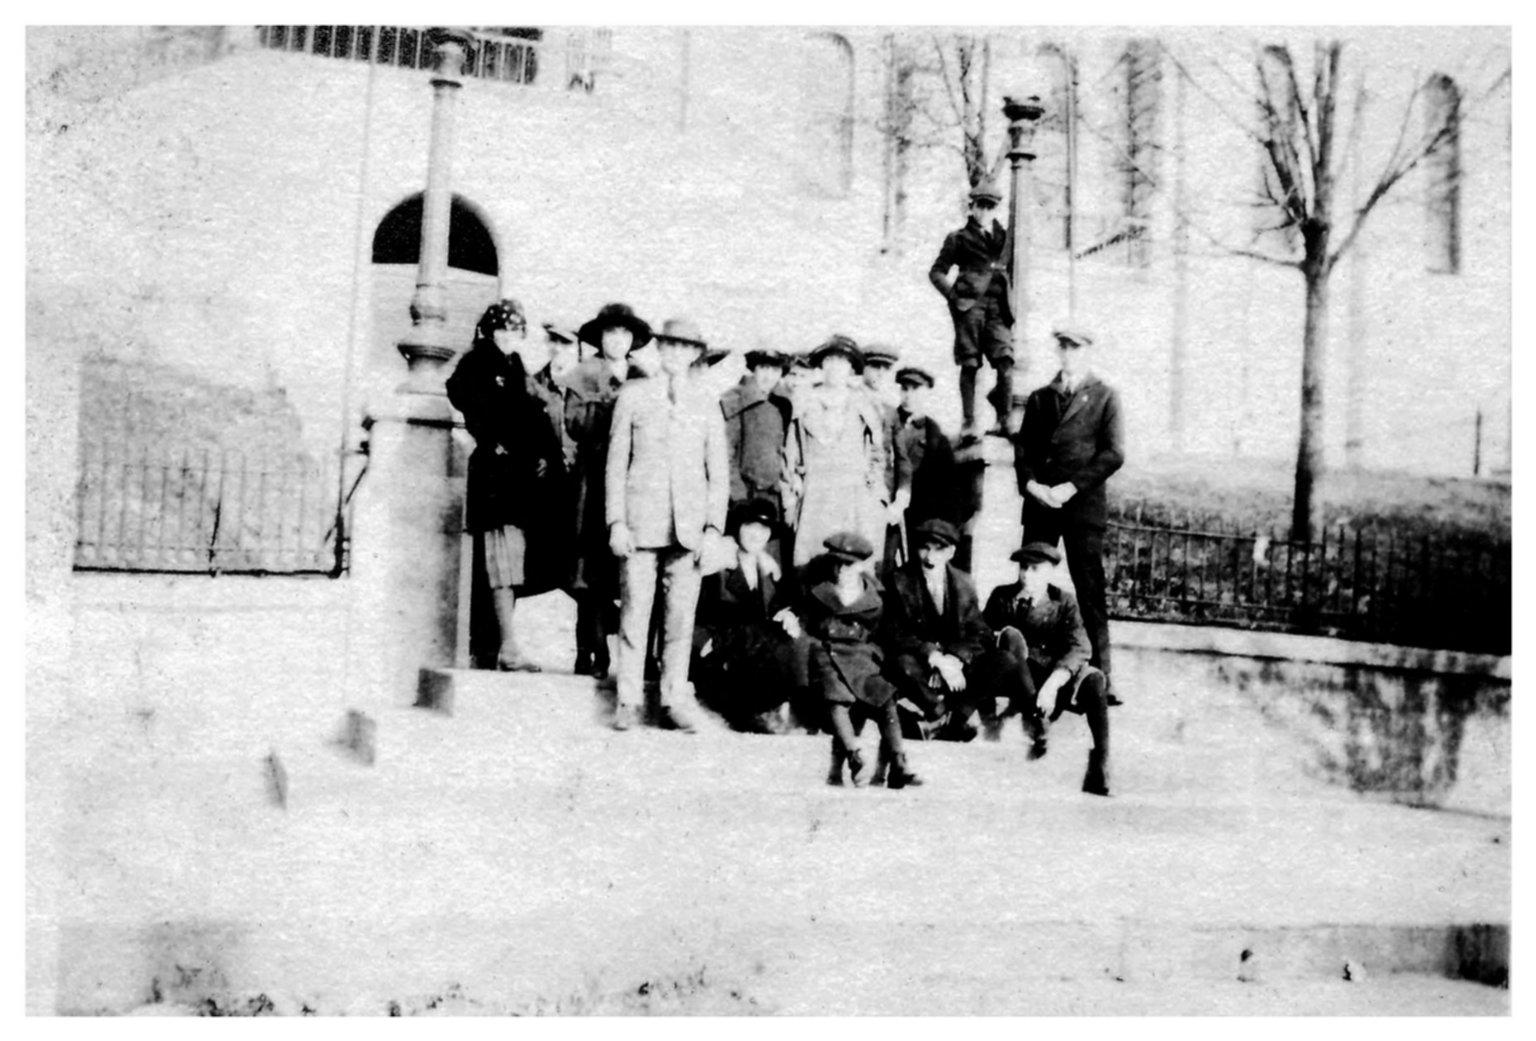 Eddyville (Nov 1, 1921)